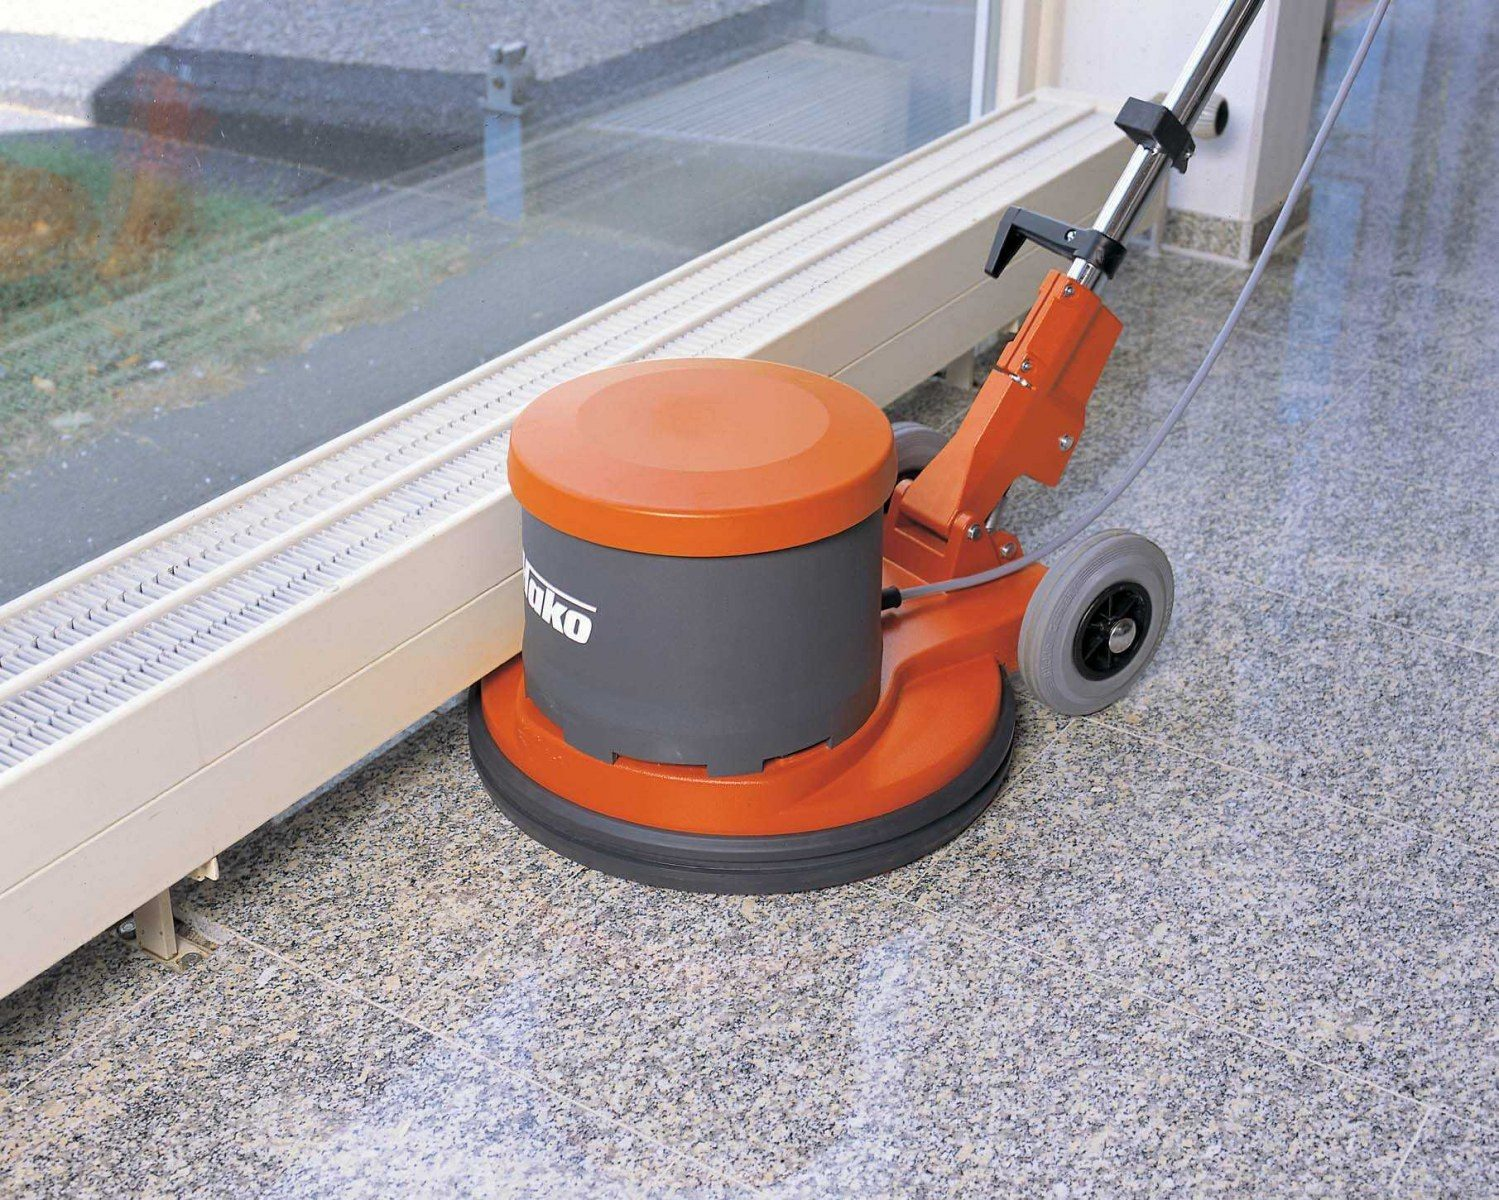 Cleanserv SD43180